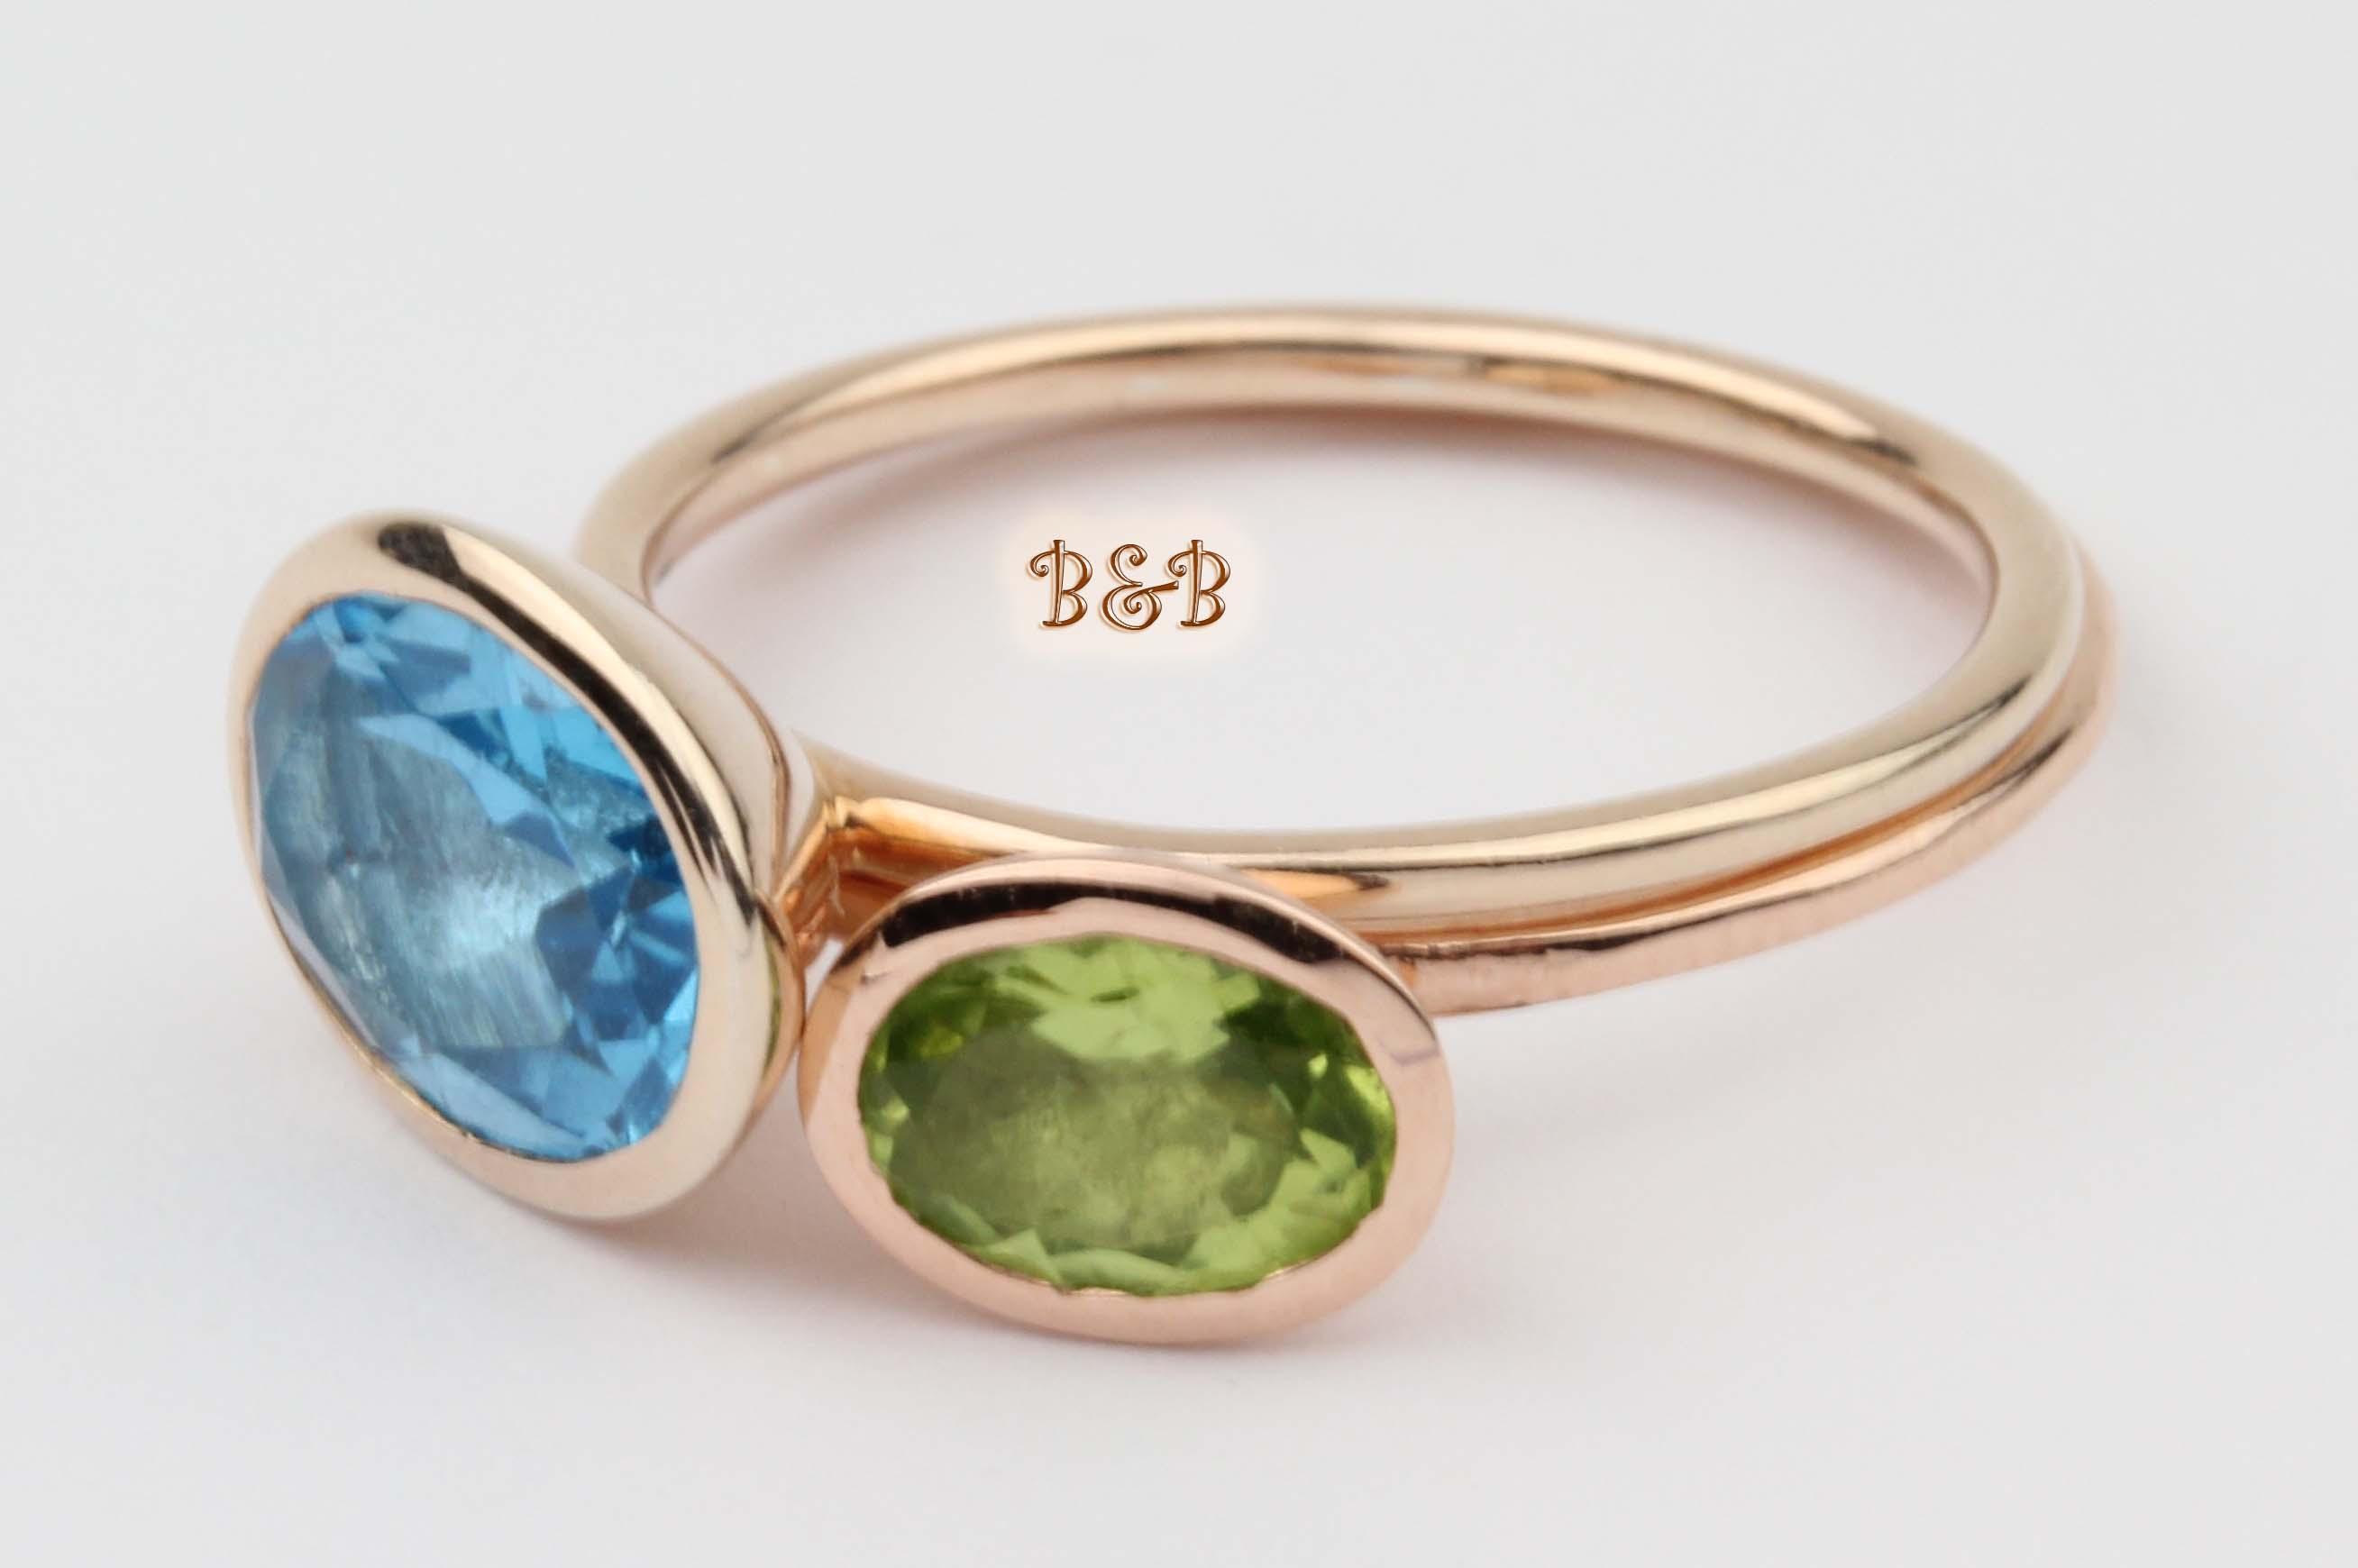 Silver ring_B&B_1849